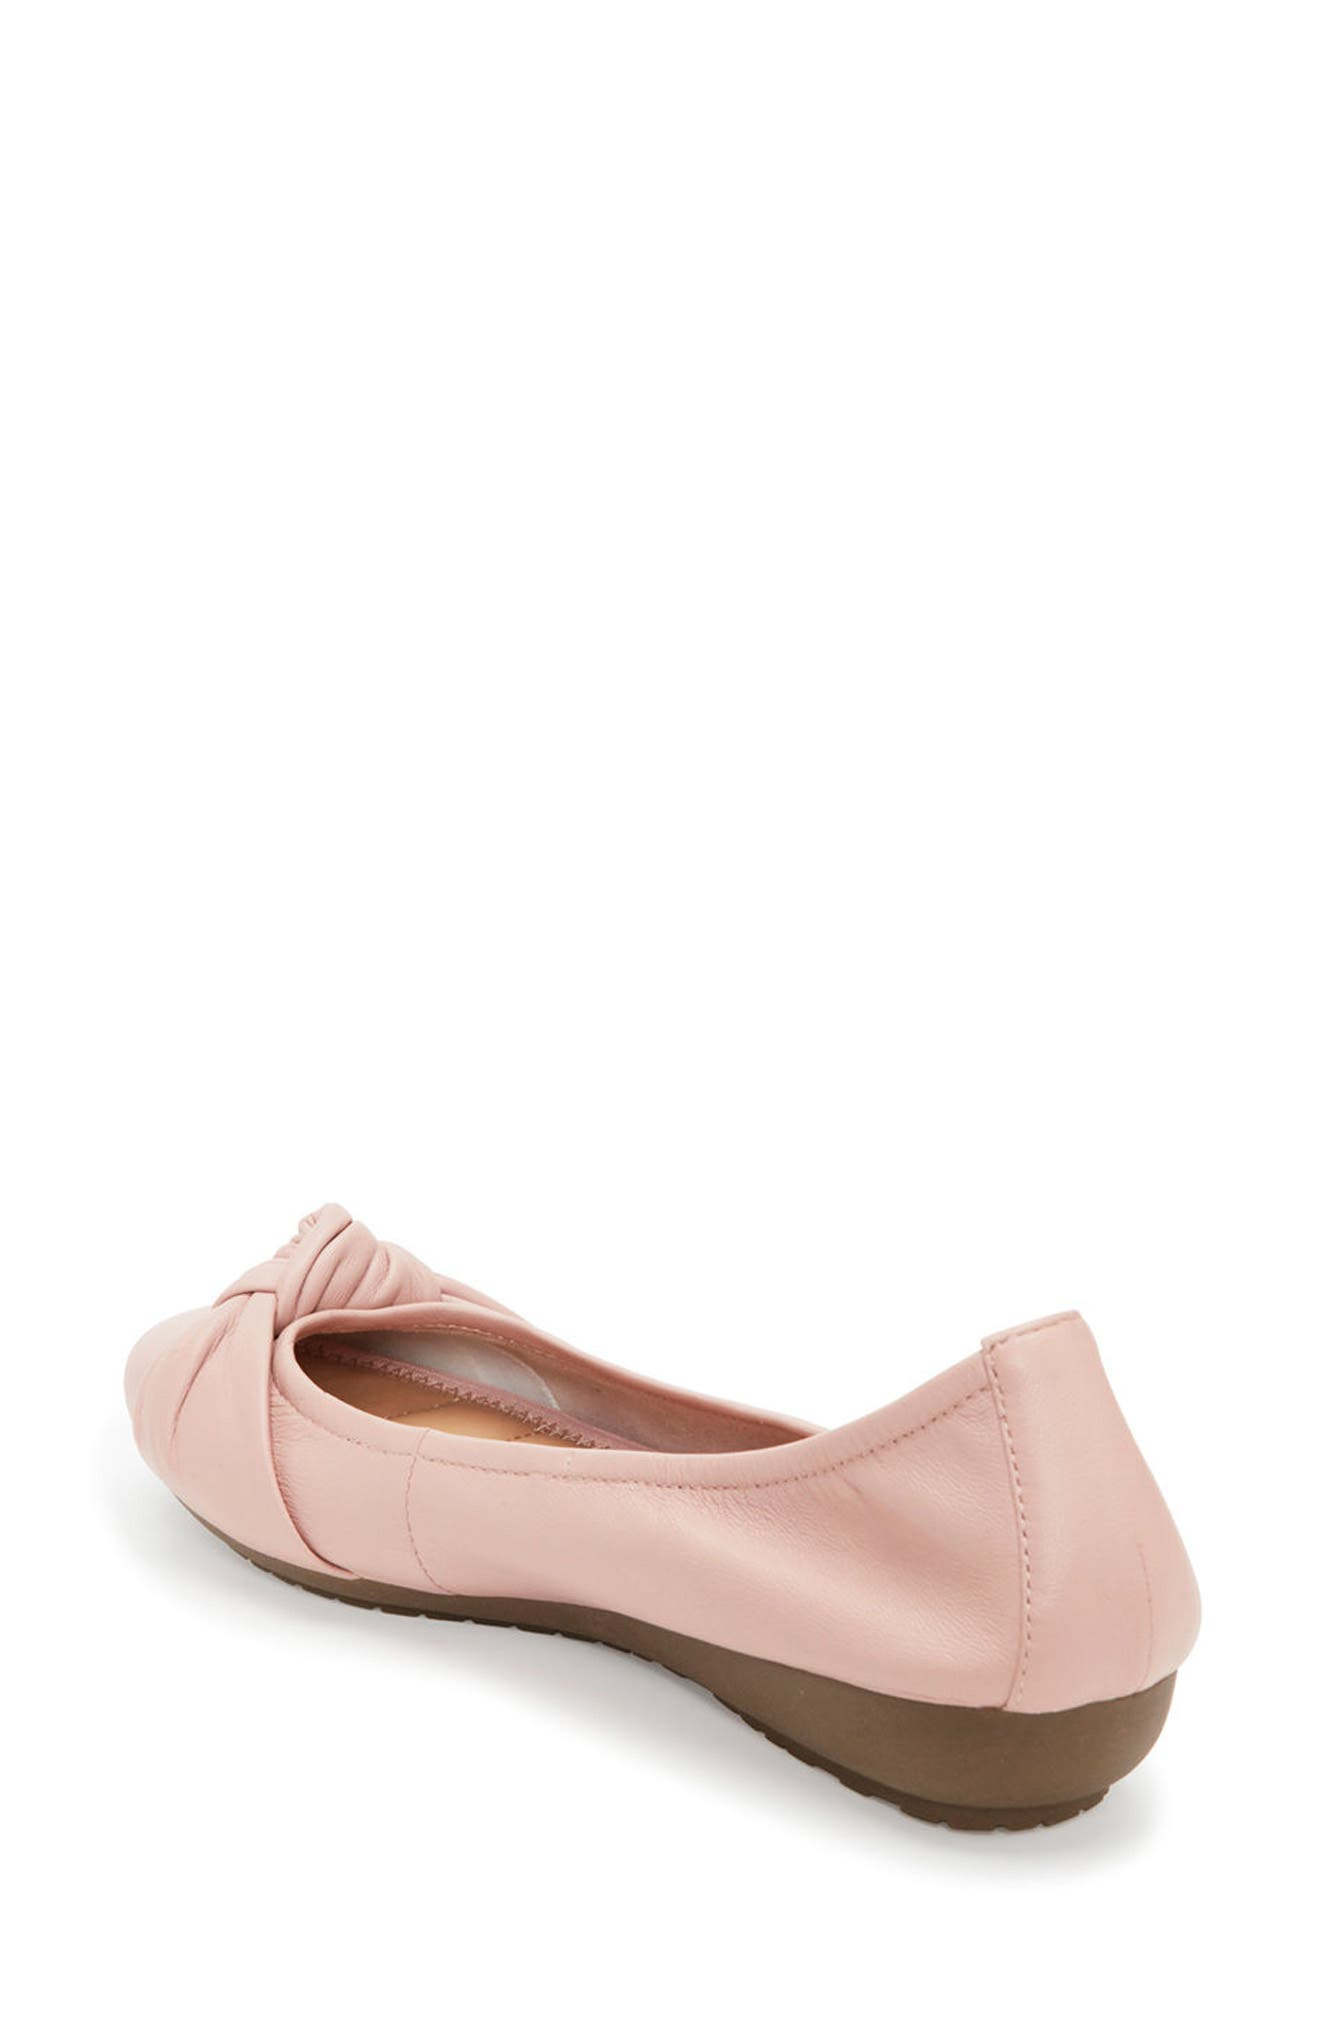 Jaci Flat,                             Alternate thumbnail 2, color,                             Pink Leather